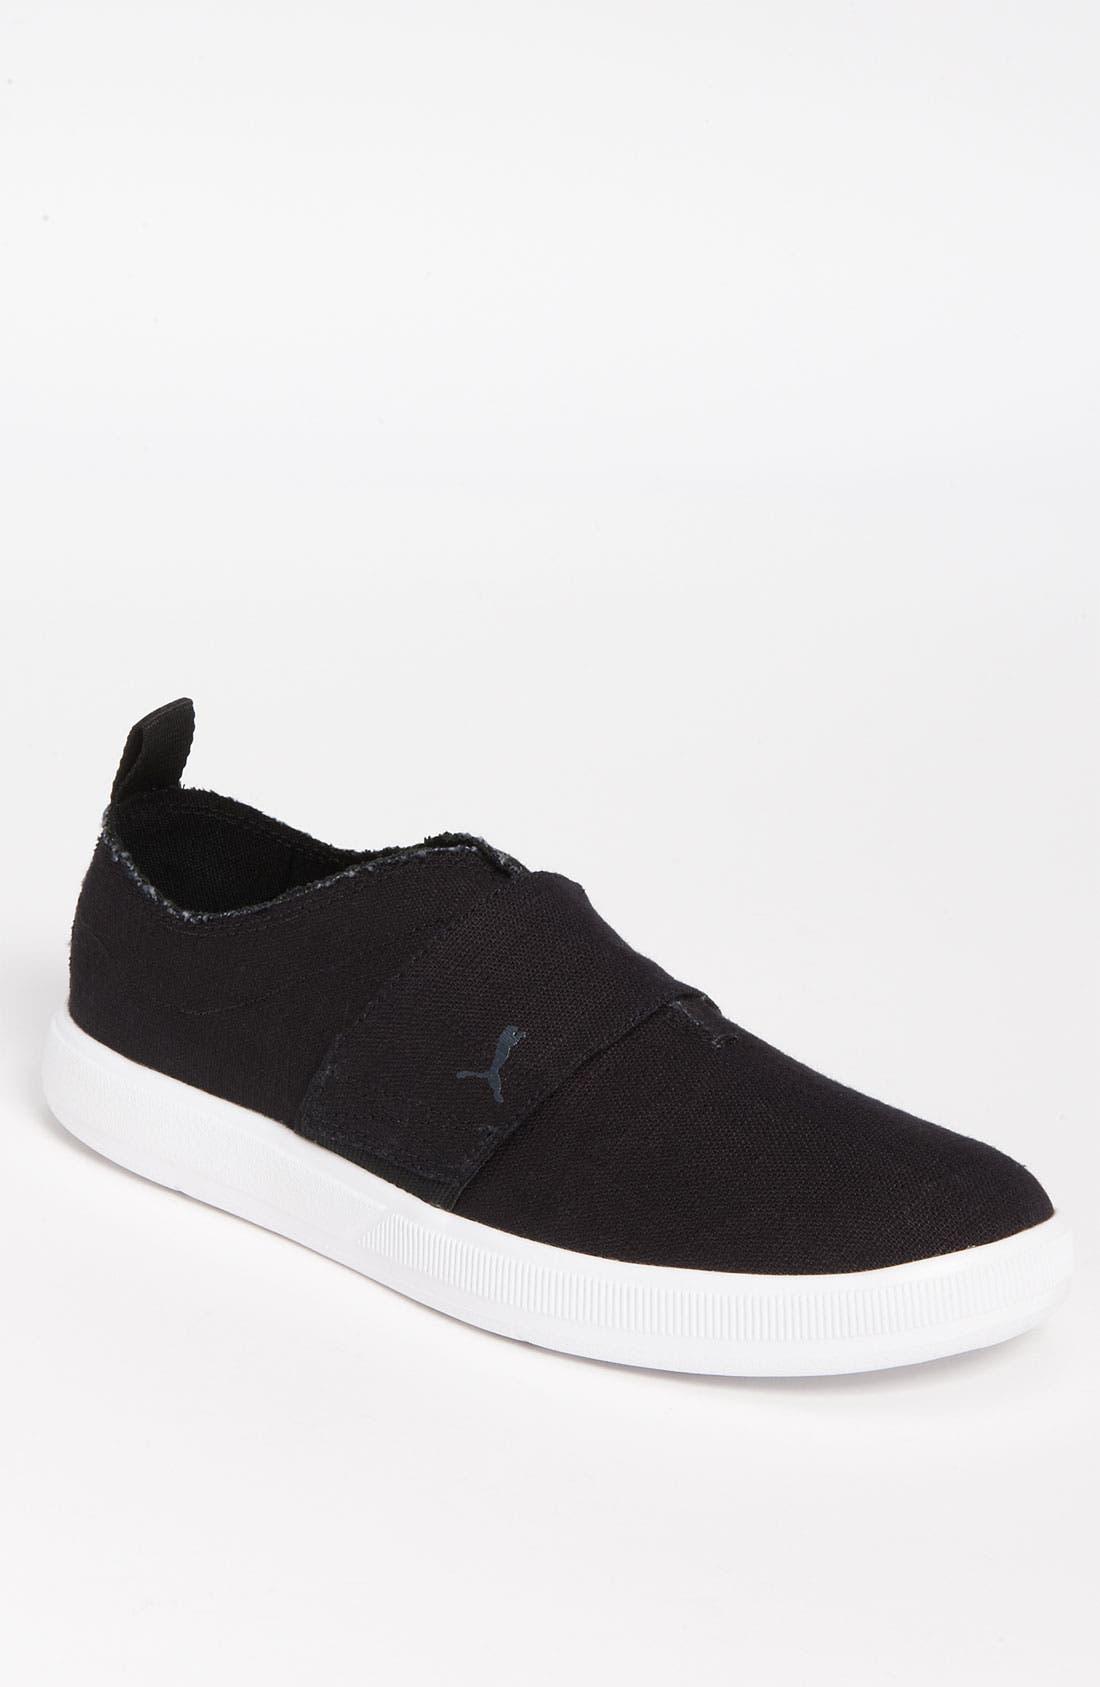 Alternate Image 1 Selected - PUMA 'El Rey Lite' Sneaker (Men) (Online Exclusive)